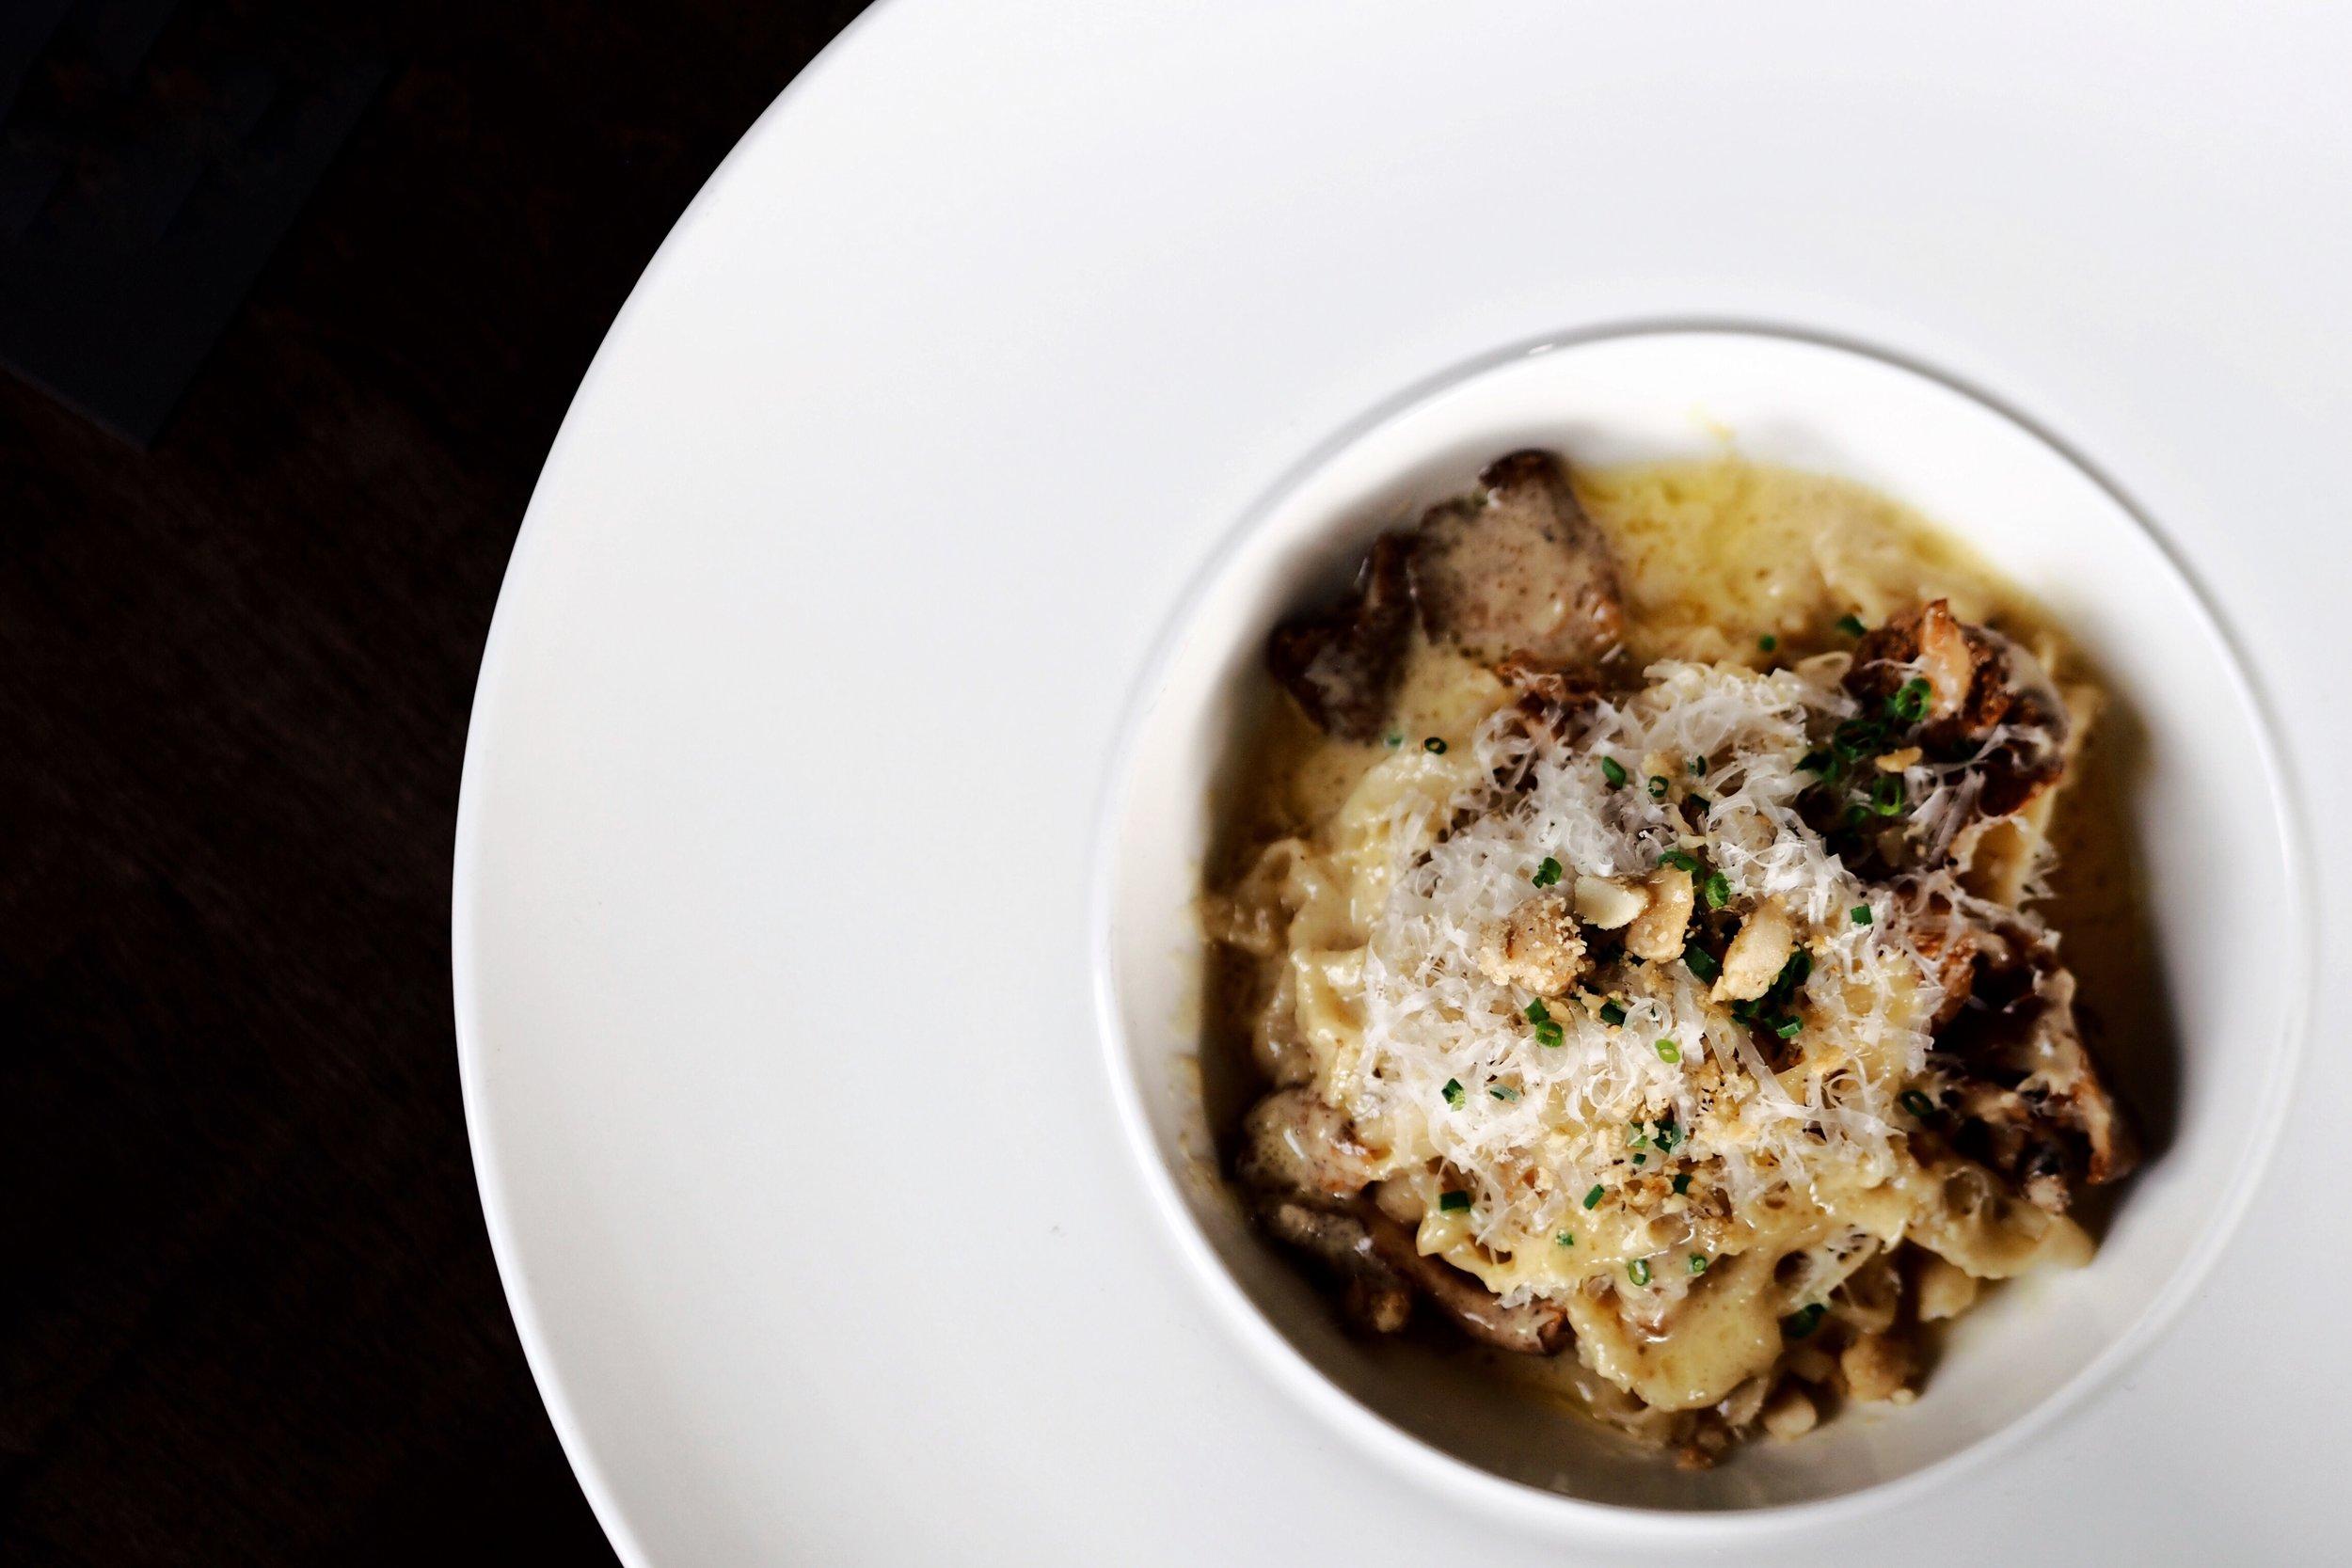 Pasta : Chantrelle, Macadamia ($22.00 + tax)